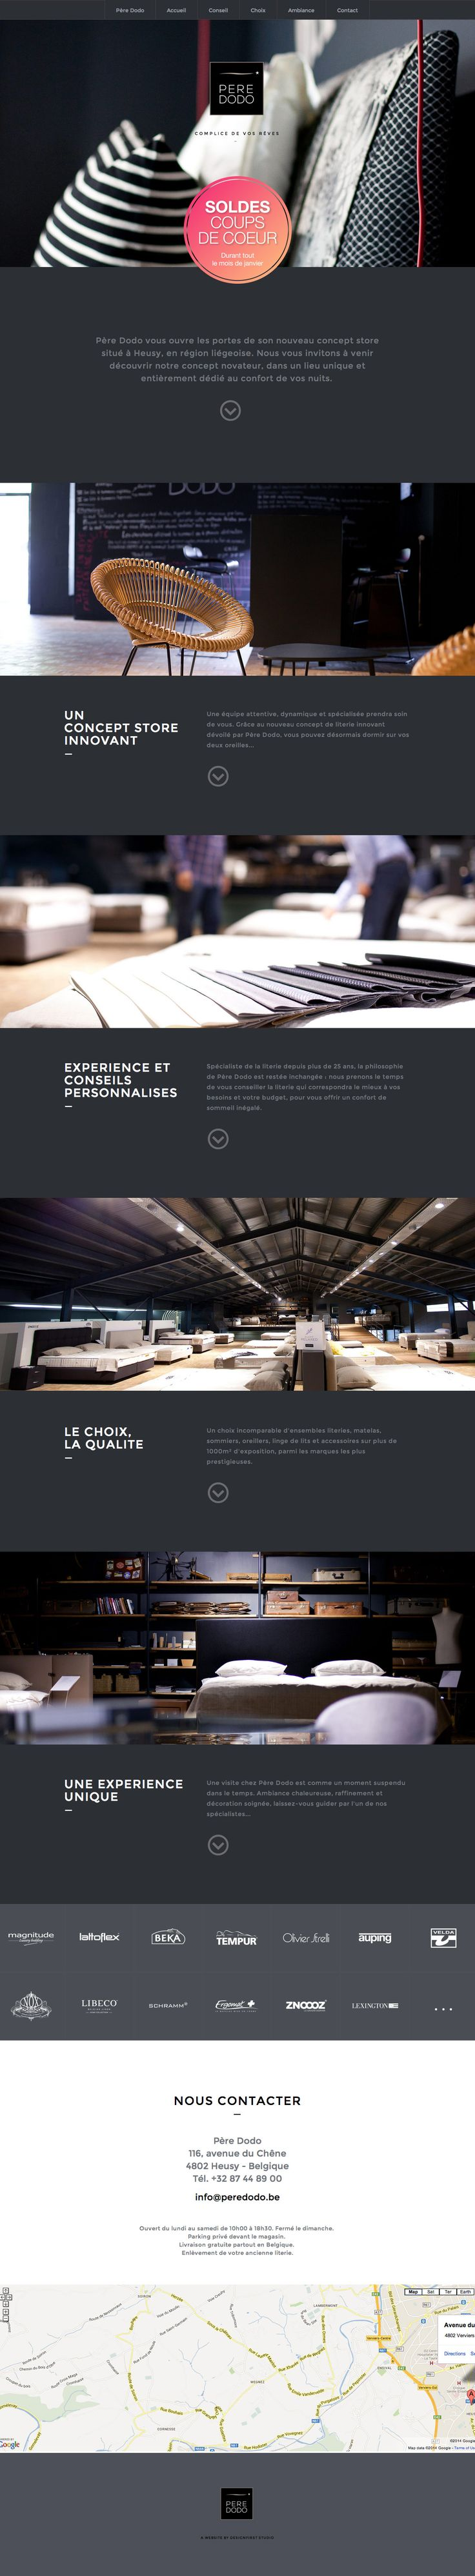 http://www.peredodo.be/ | #webdesign #it #web #design #layout #userinterface #website #webdesign < repinned by www.BlickeDeeler.de | Visit our website www.blickedeeler.de/leistungen/webdesign